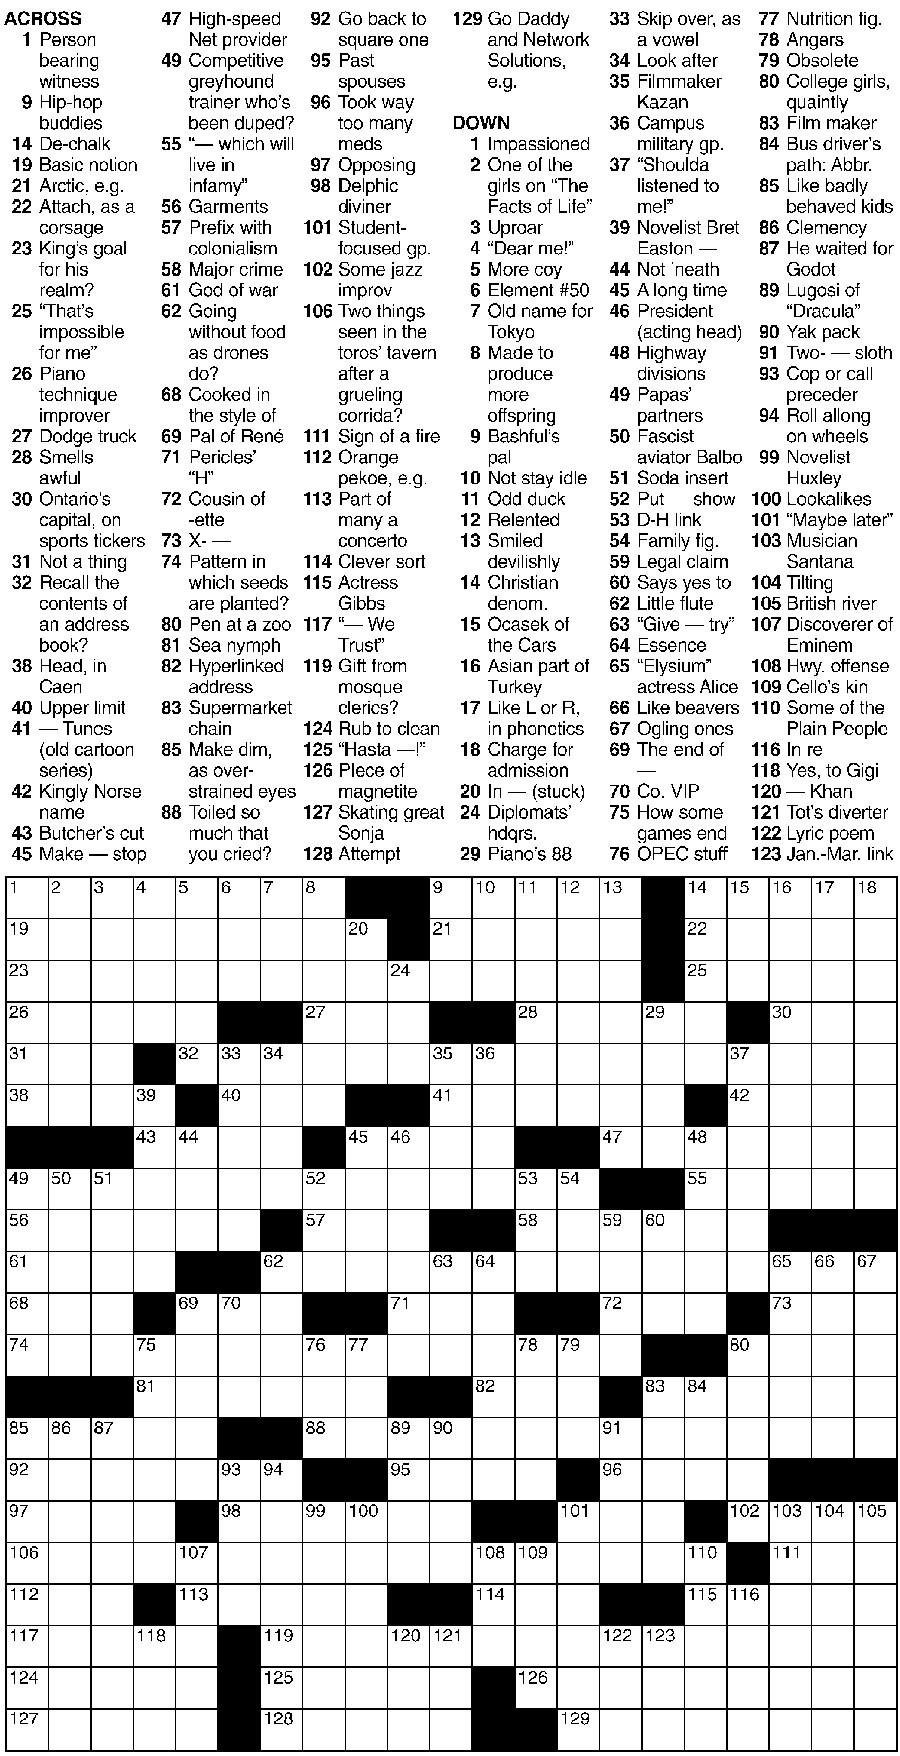 crossword1-2-0d5eda650152b5d2.jpg